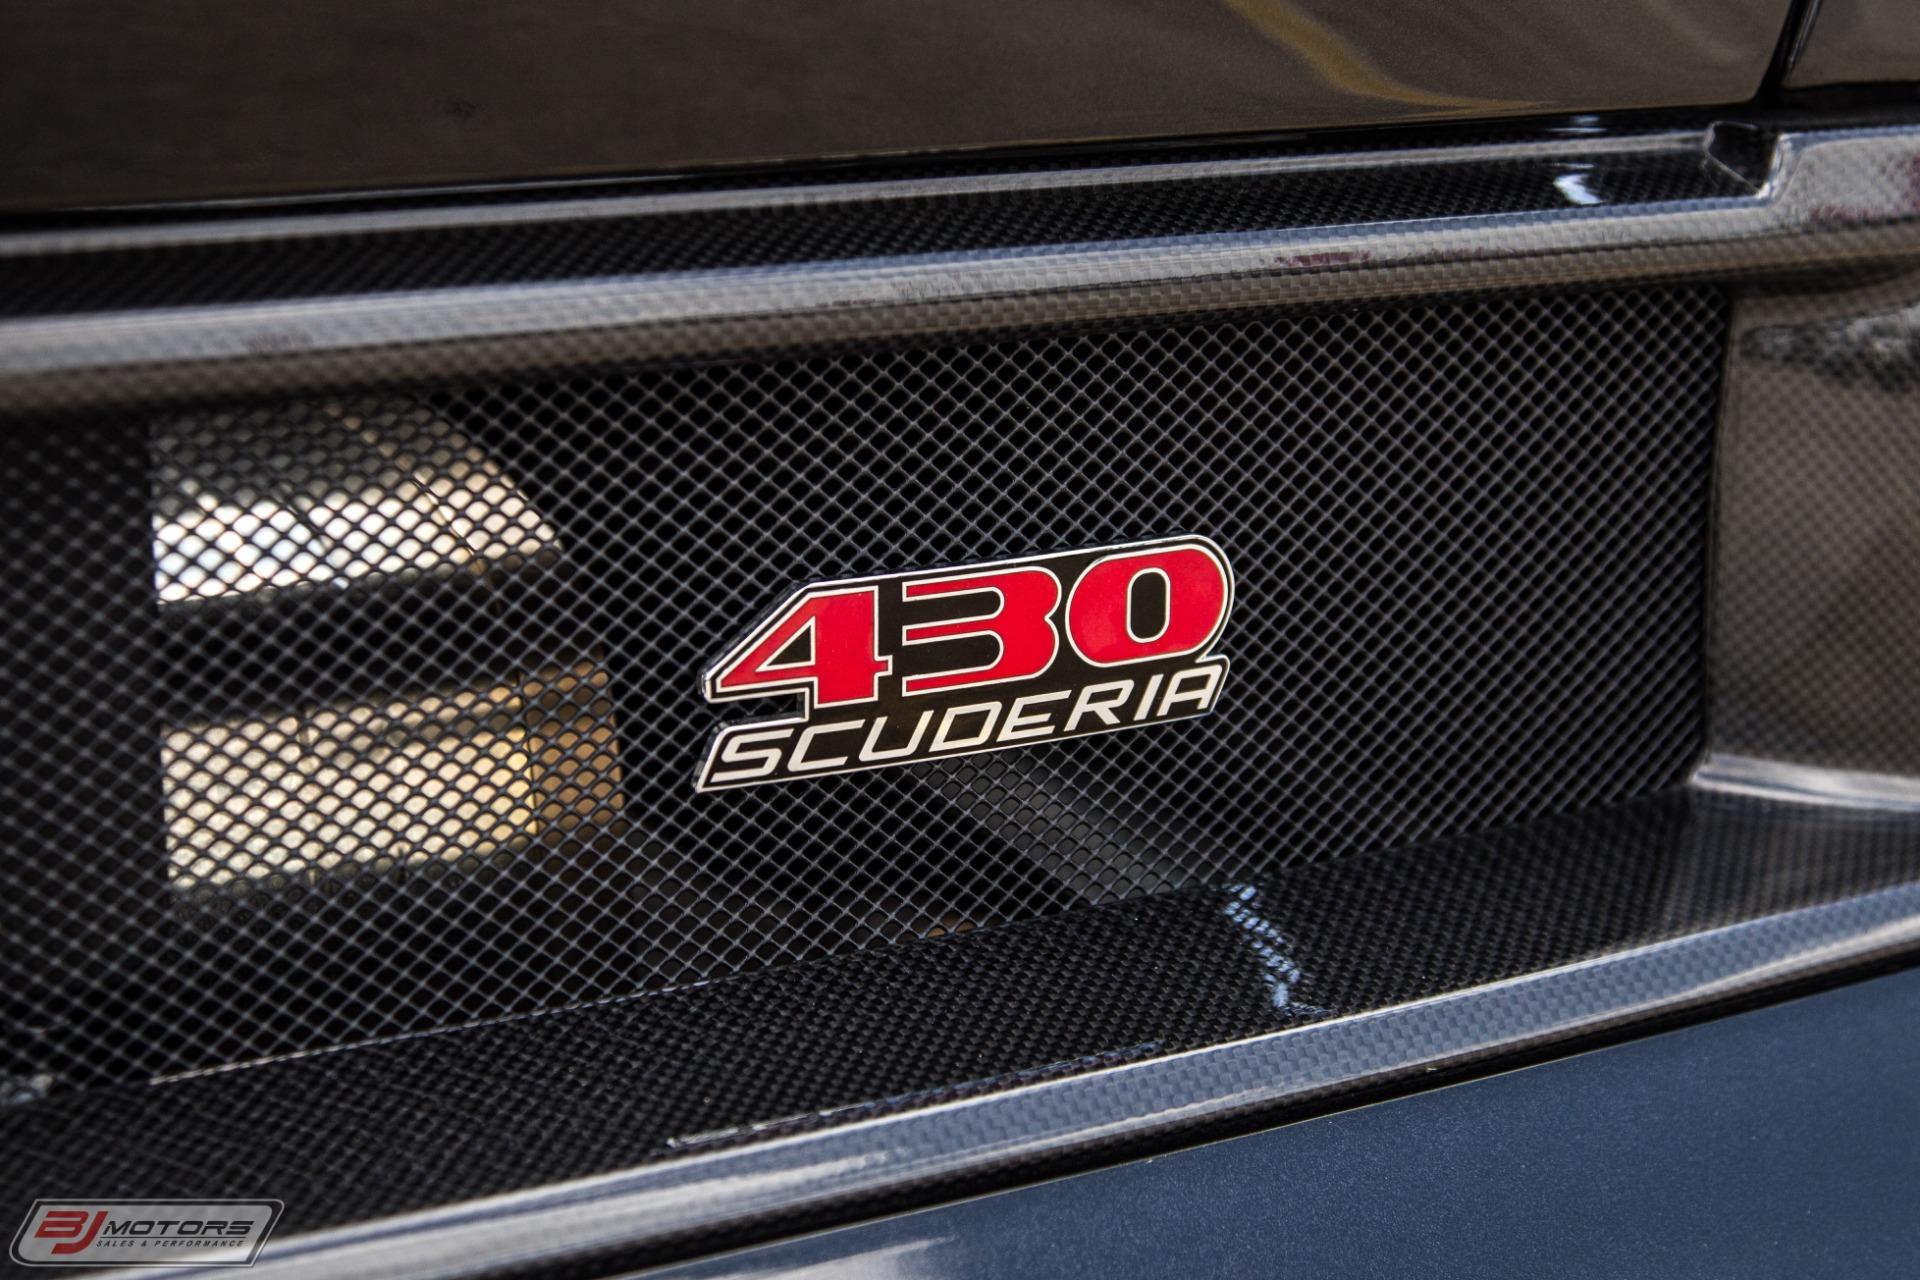 Used-2008-Ferrari-430-Full-PPF-Serviced-Scuderia